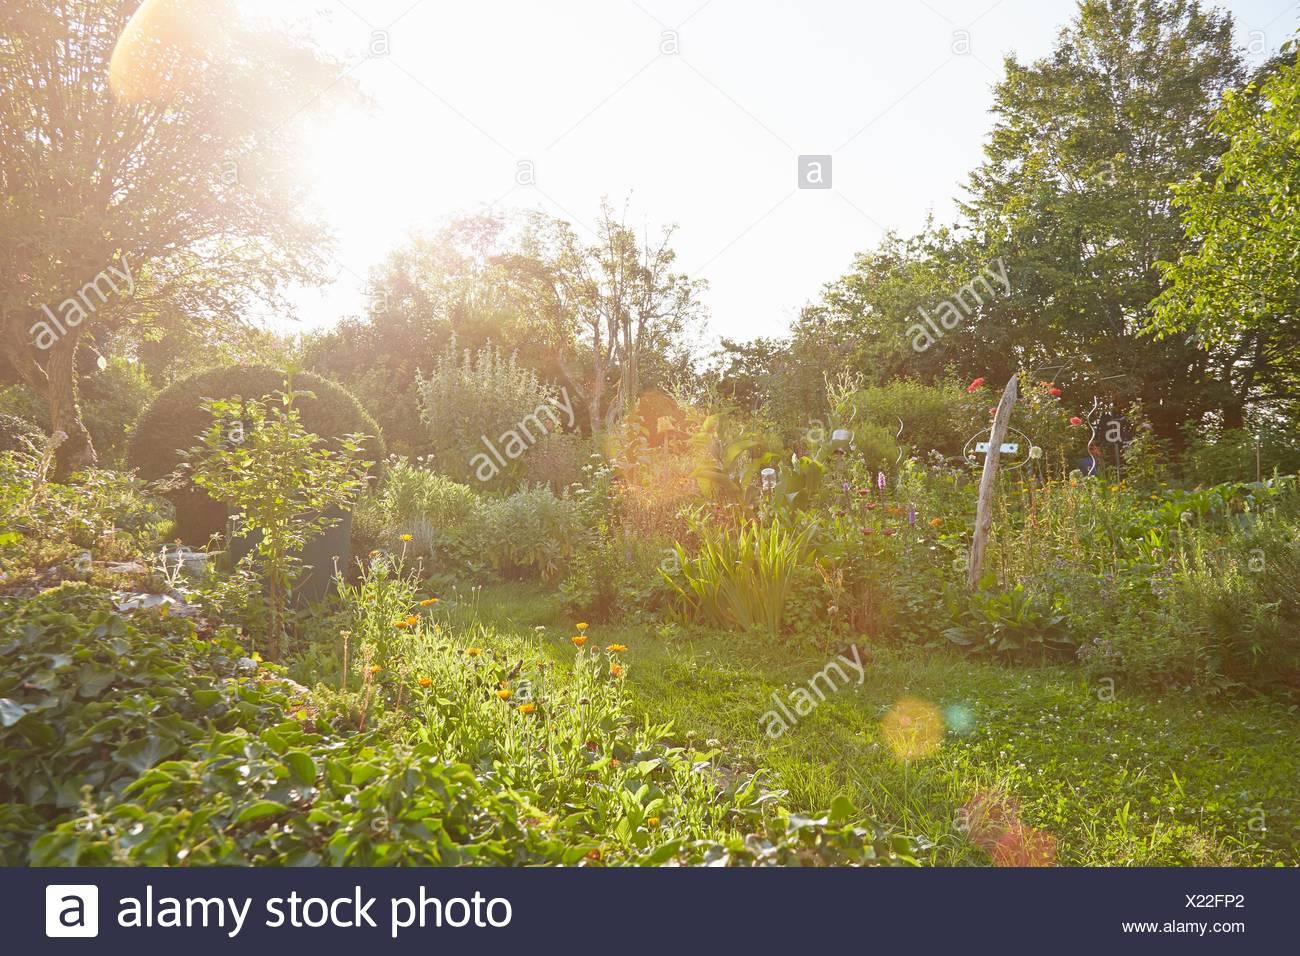 Herb garden in sunlight - Stock Image